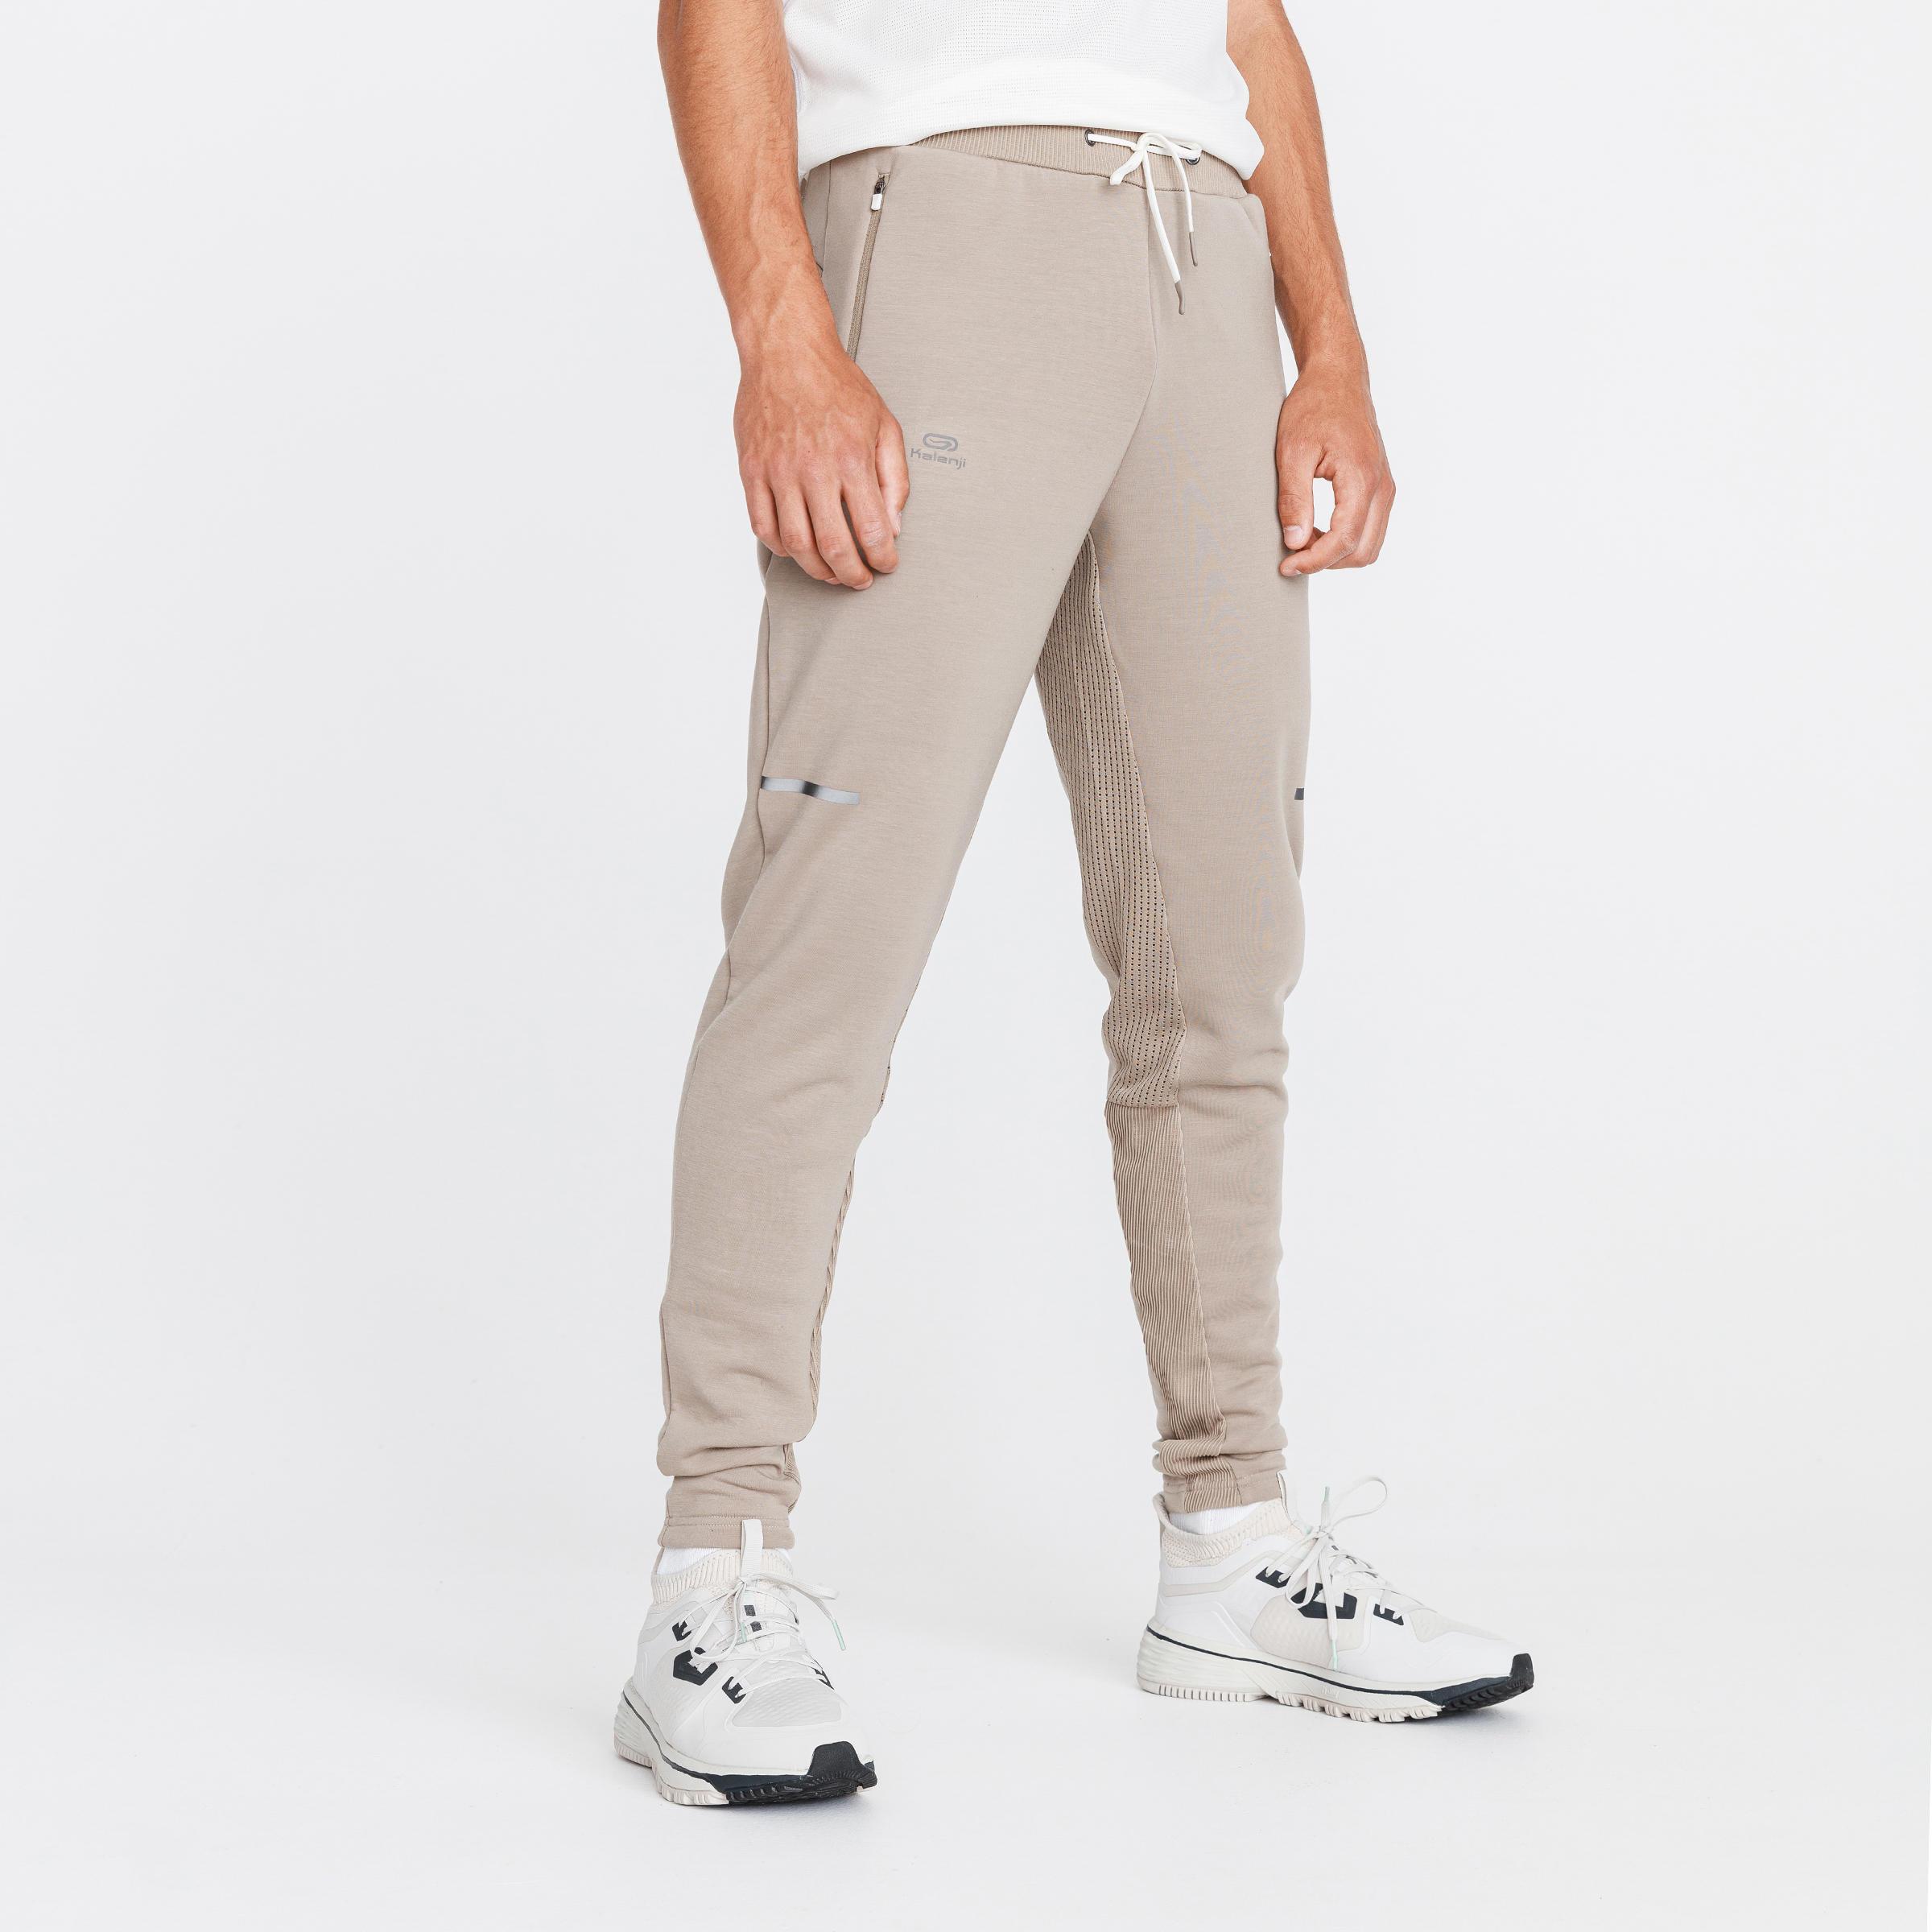 Pantalon Run Warm+ Bărbați la Reducere poza